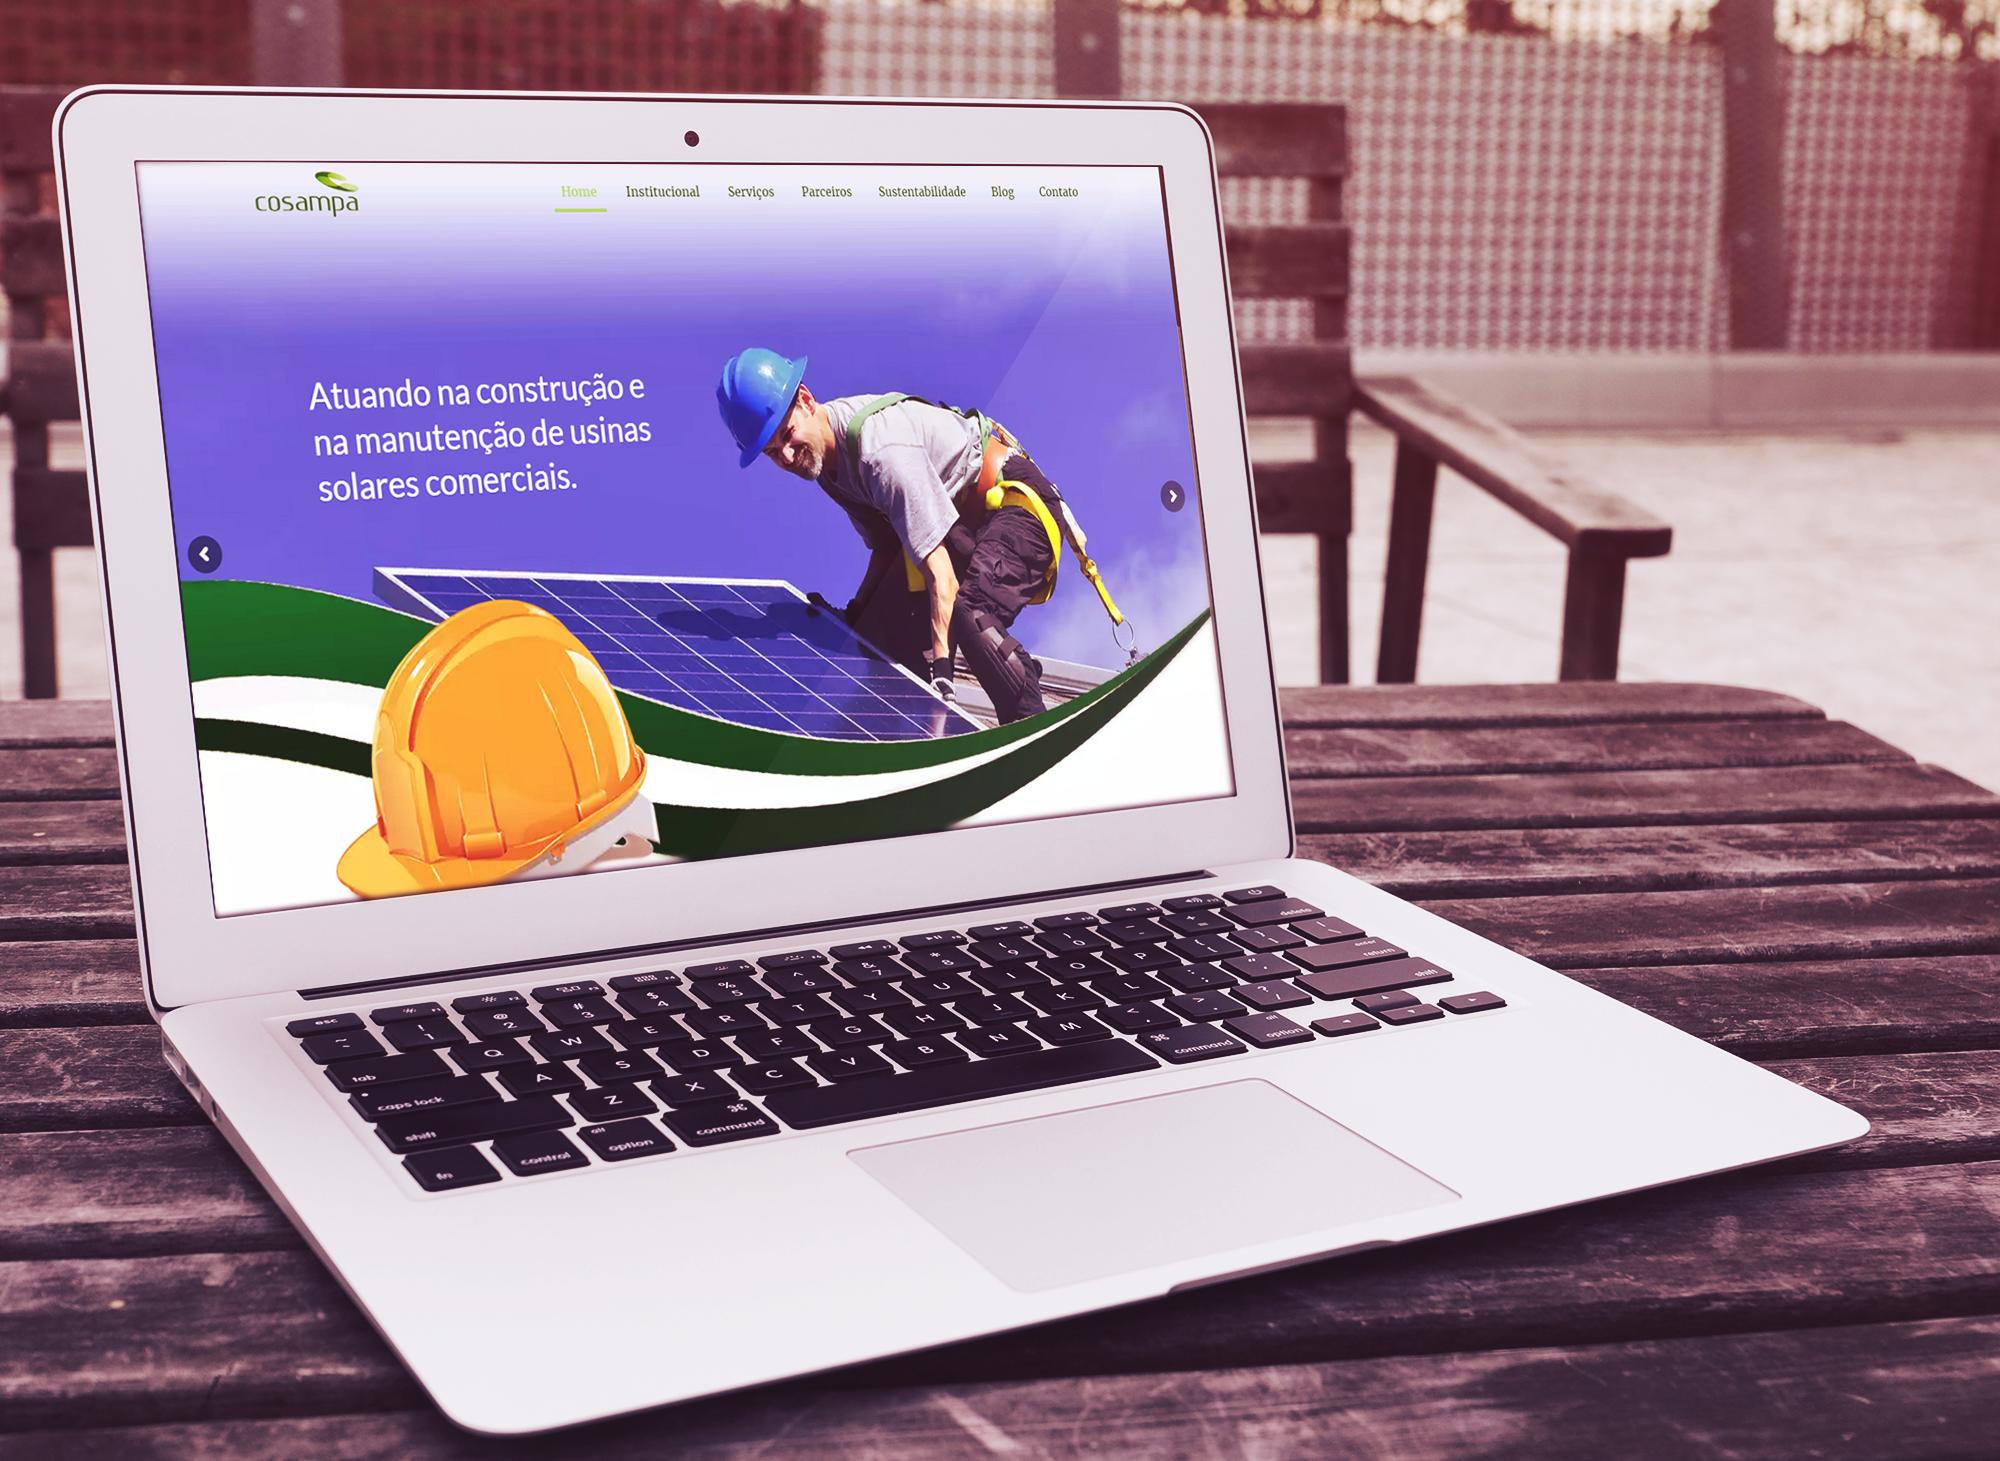 site-cosampa-energia-eletrica-renovavel-construcao-civil-portfolio-agencia-diretriz-digital-marketing-fortaleza1